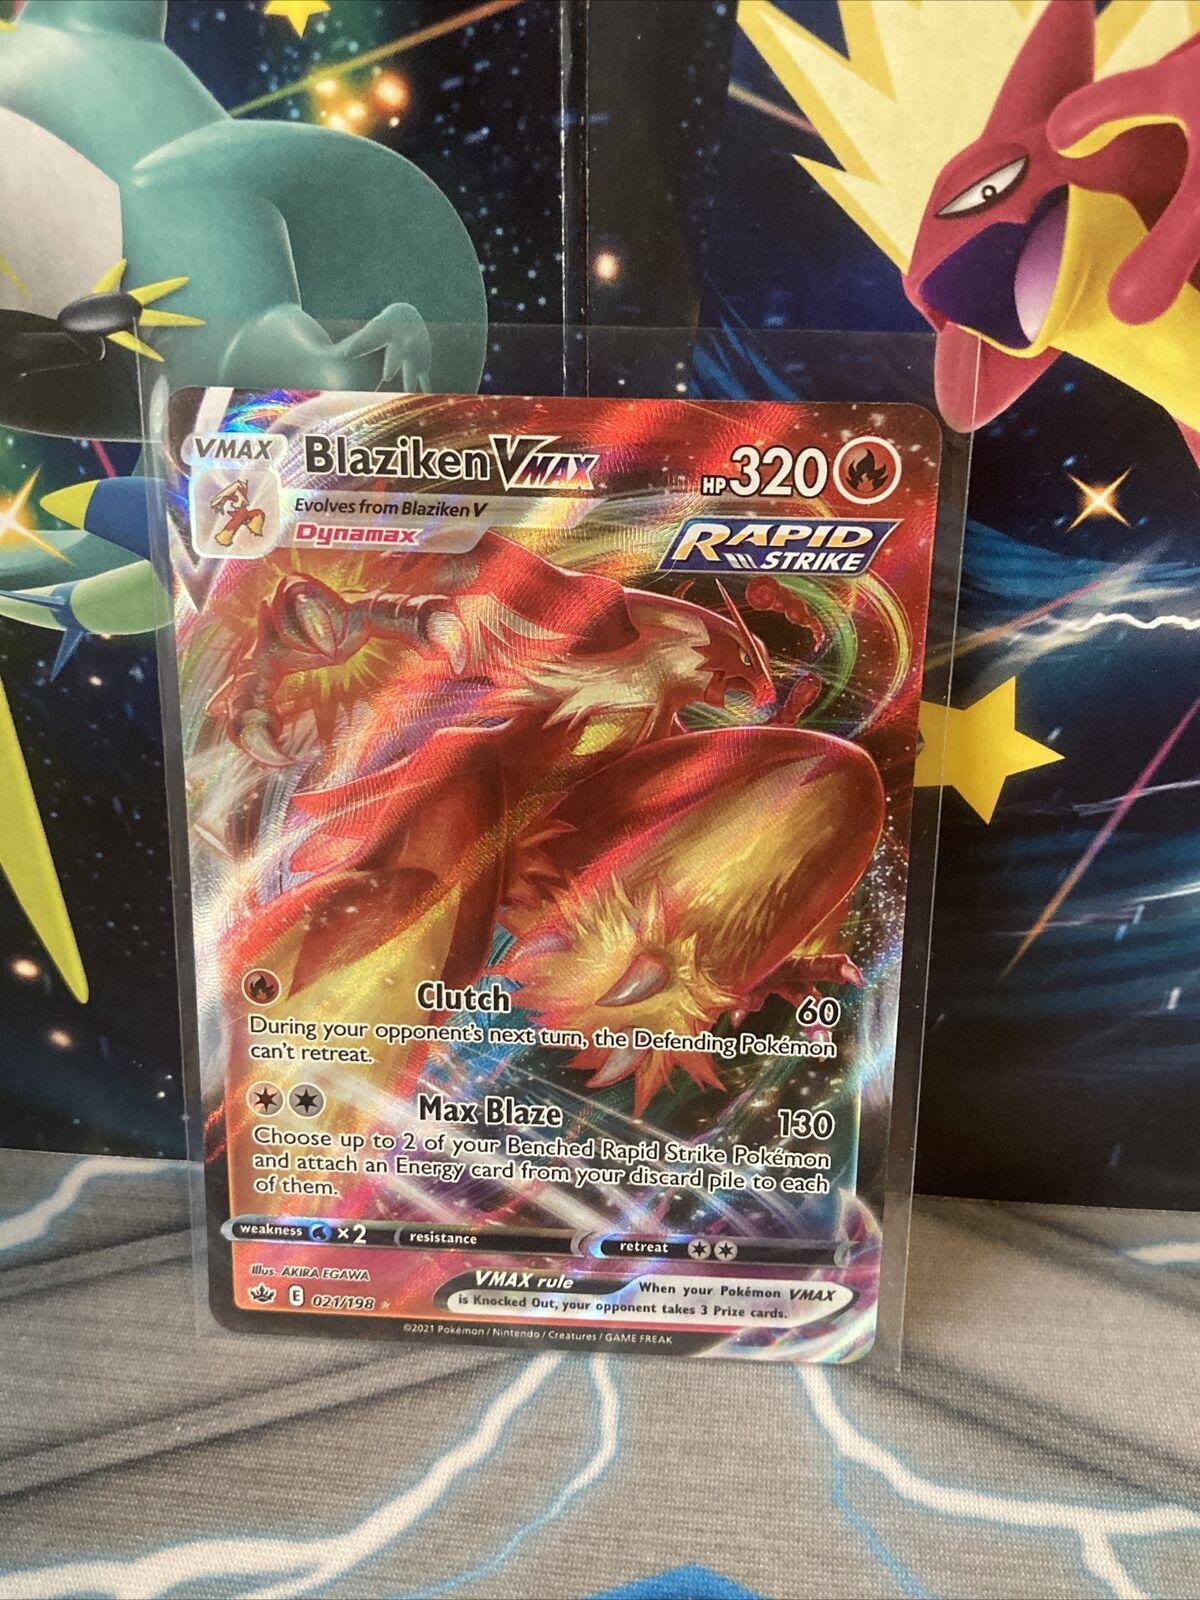 Pokémon TCG BLAZIKEN VMAX 021/198 CHILLING REIGN FRESH PULL! - Image 2